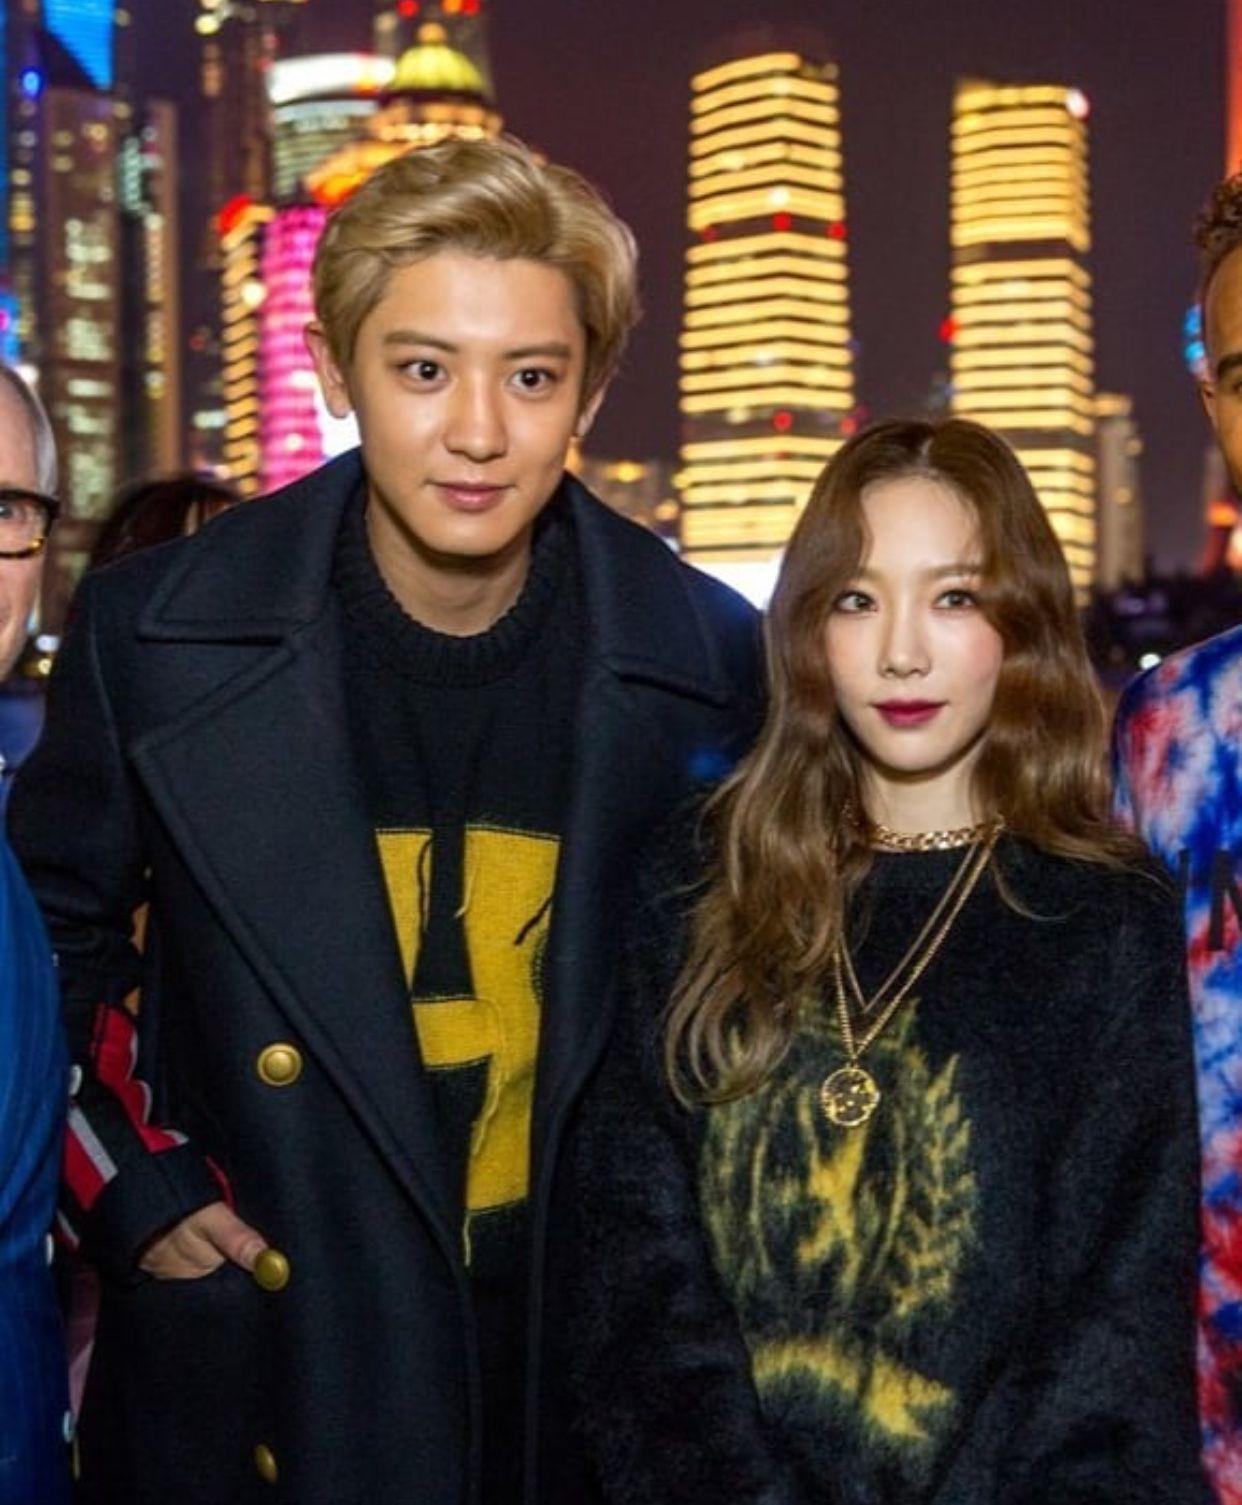 chanyeol dan Nana dating beste online dating site China